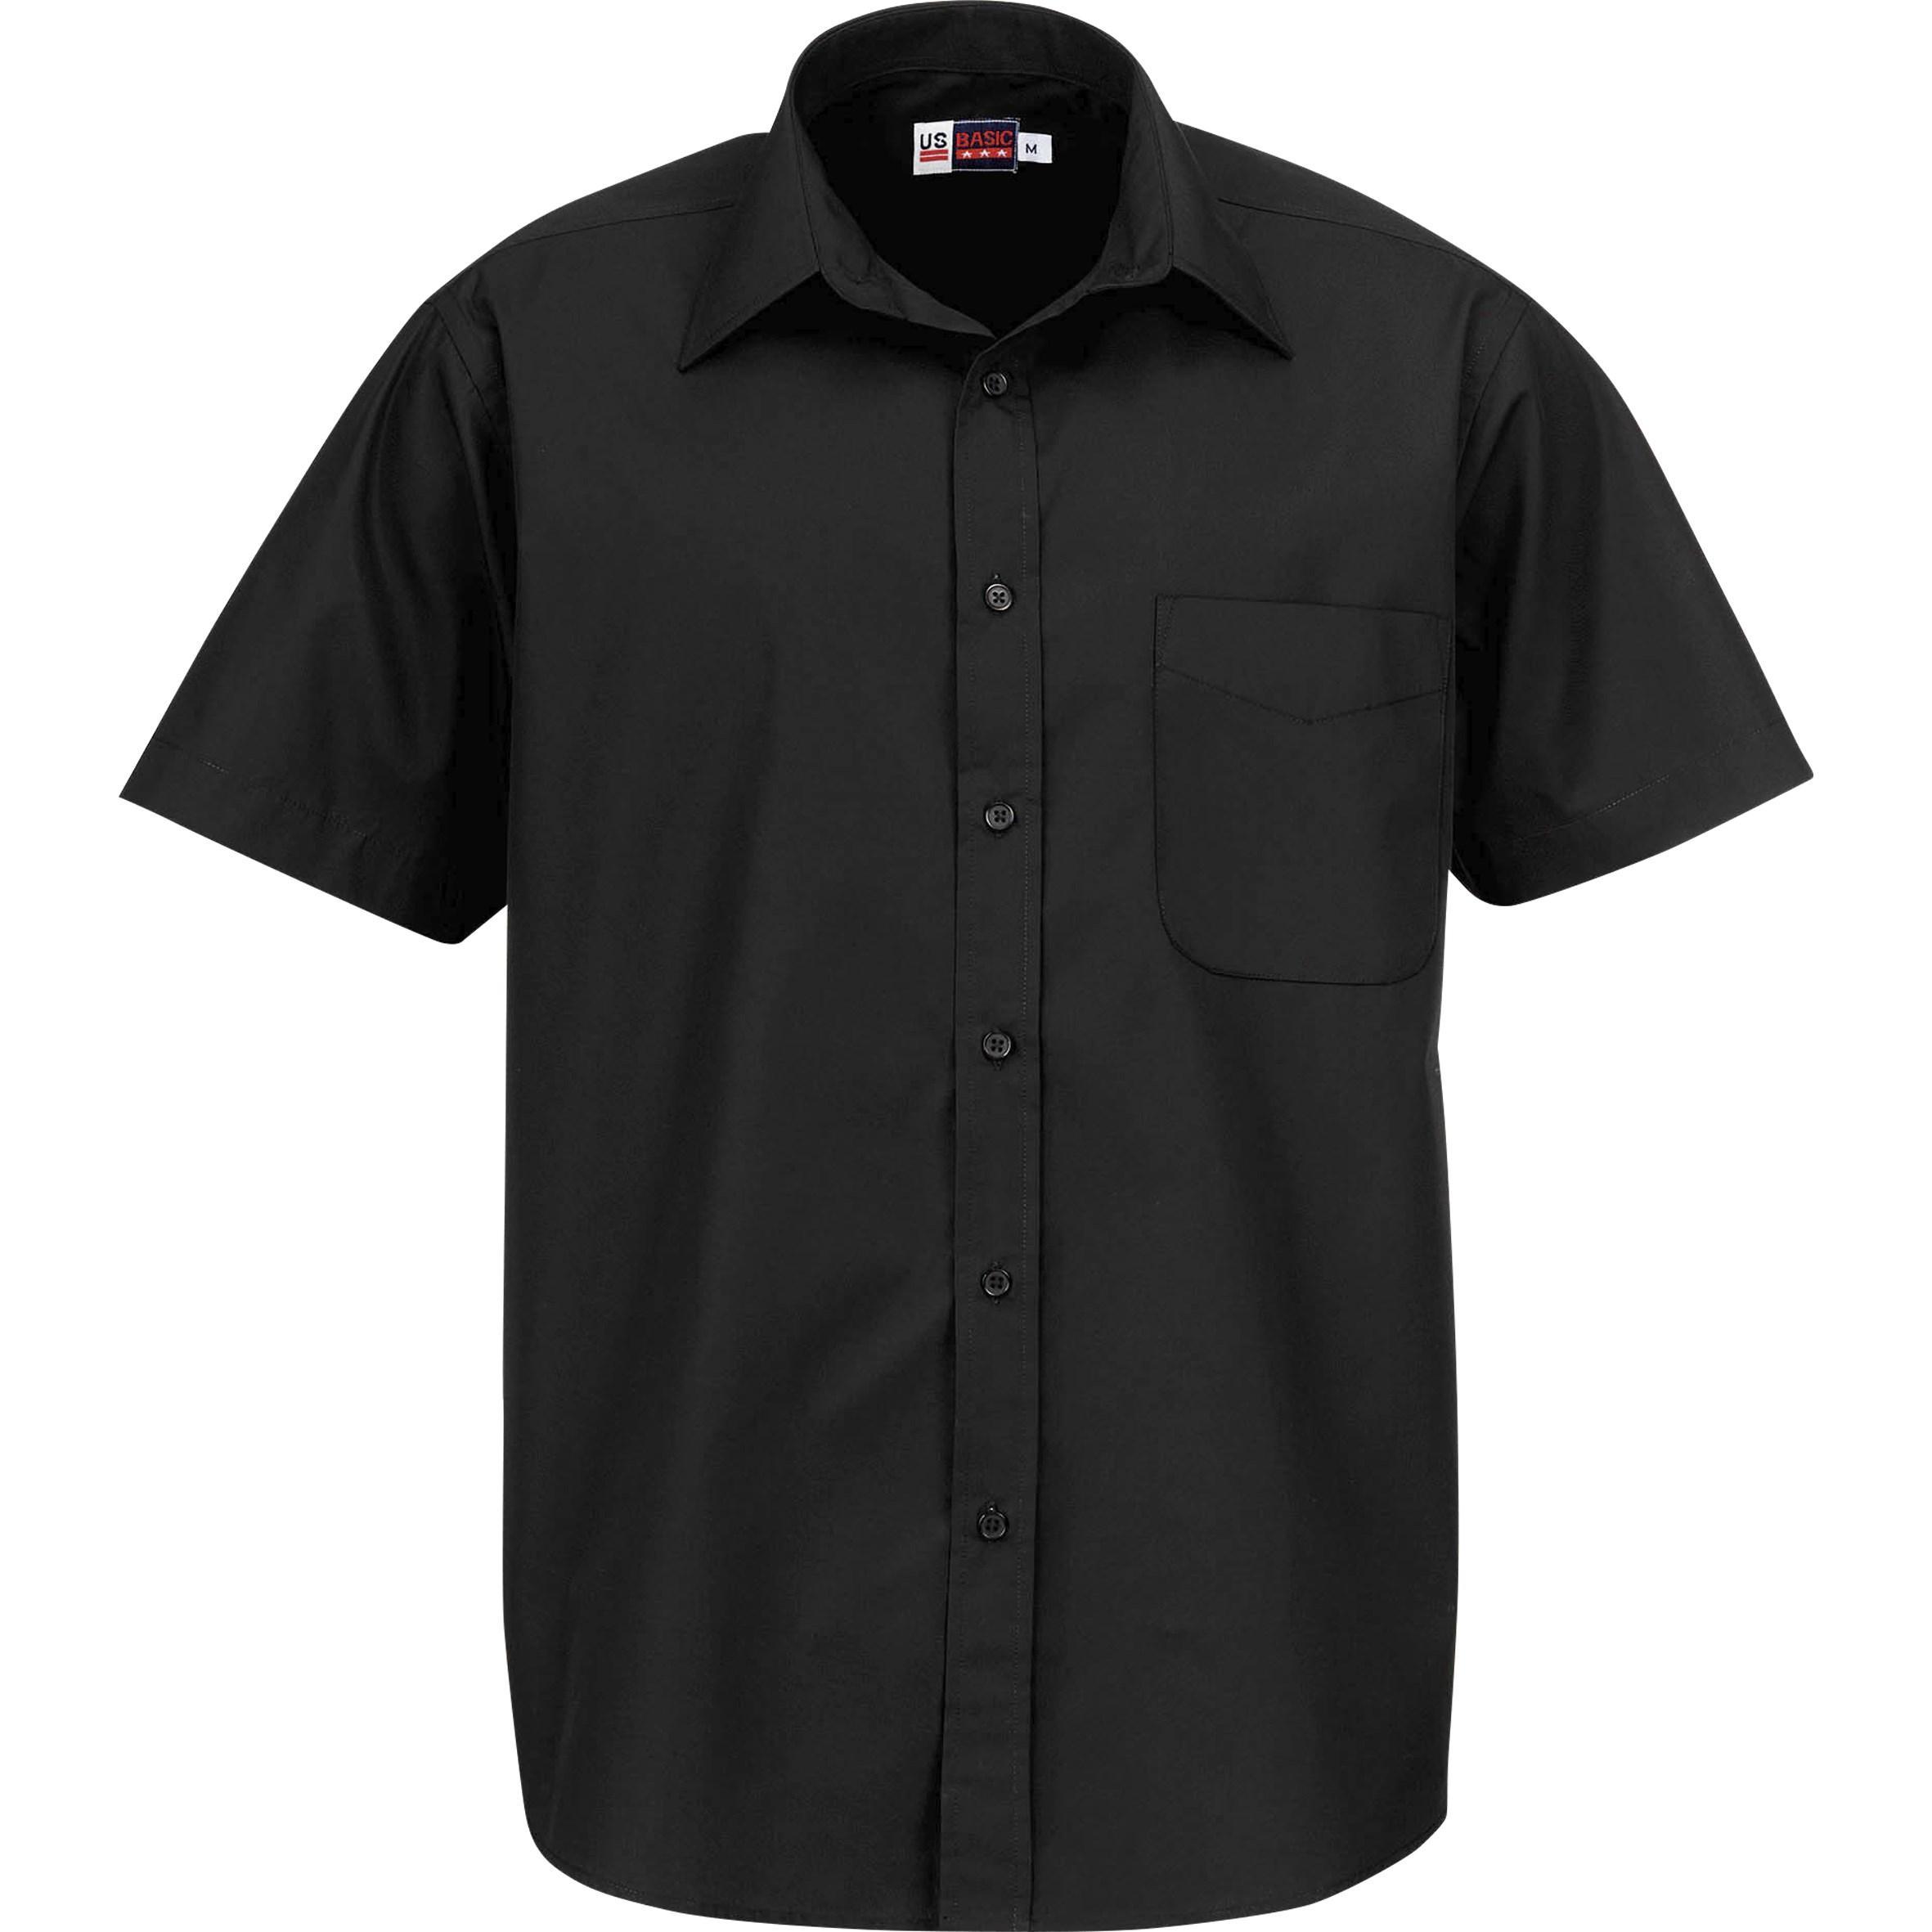 Mens Short Sleeve Washington Shirt - Black Only